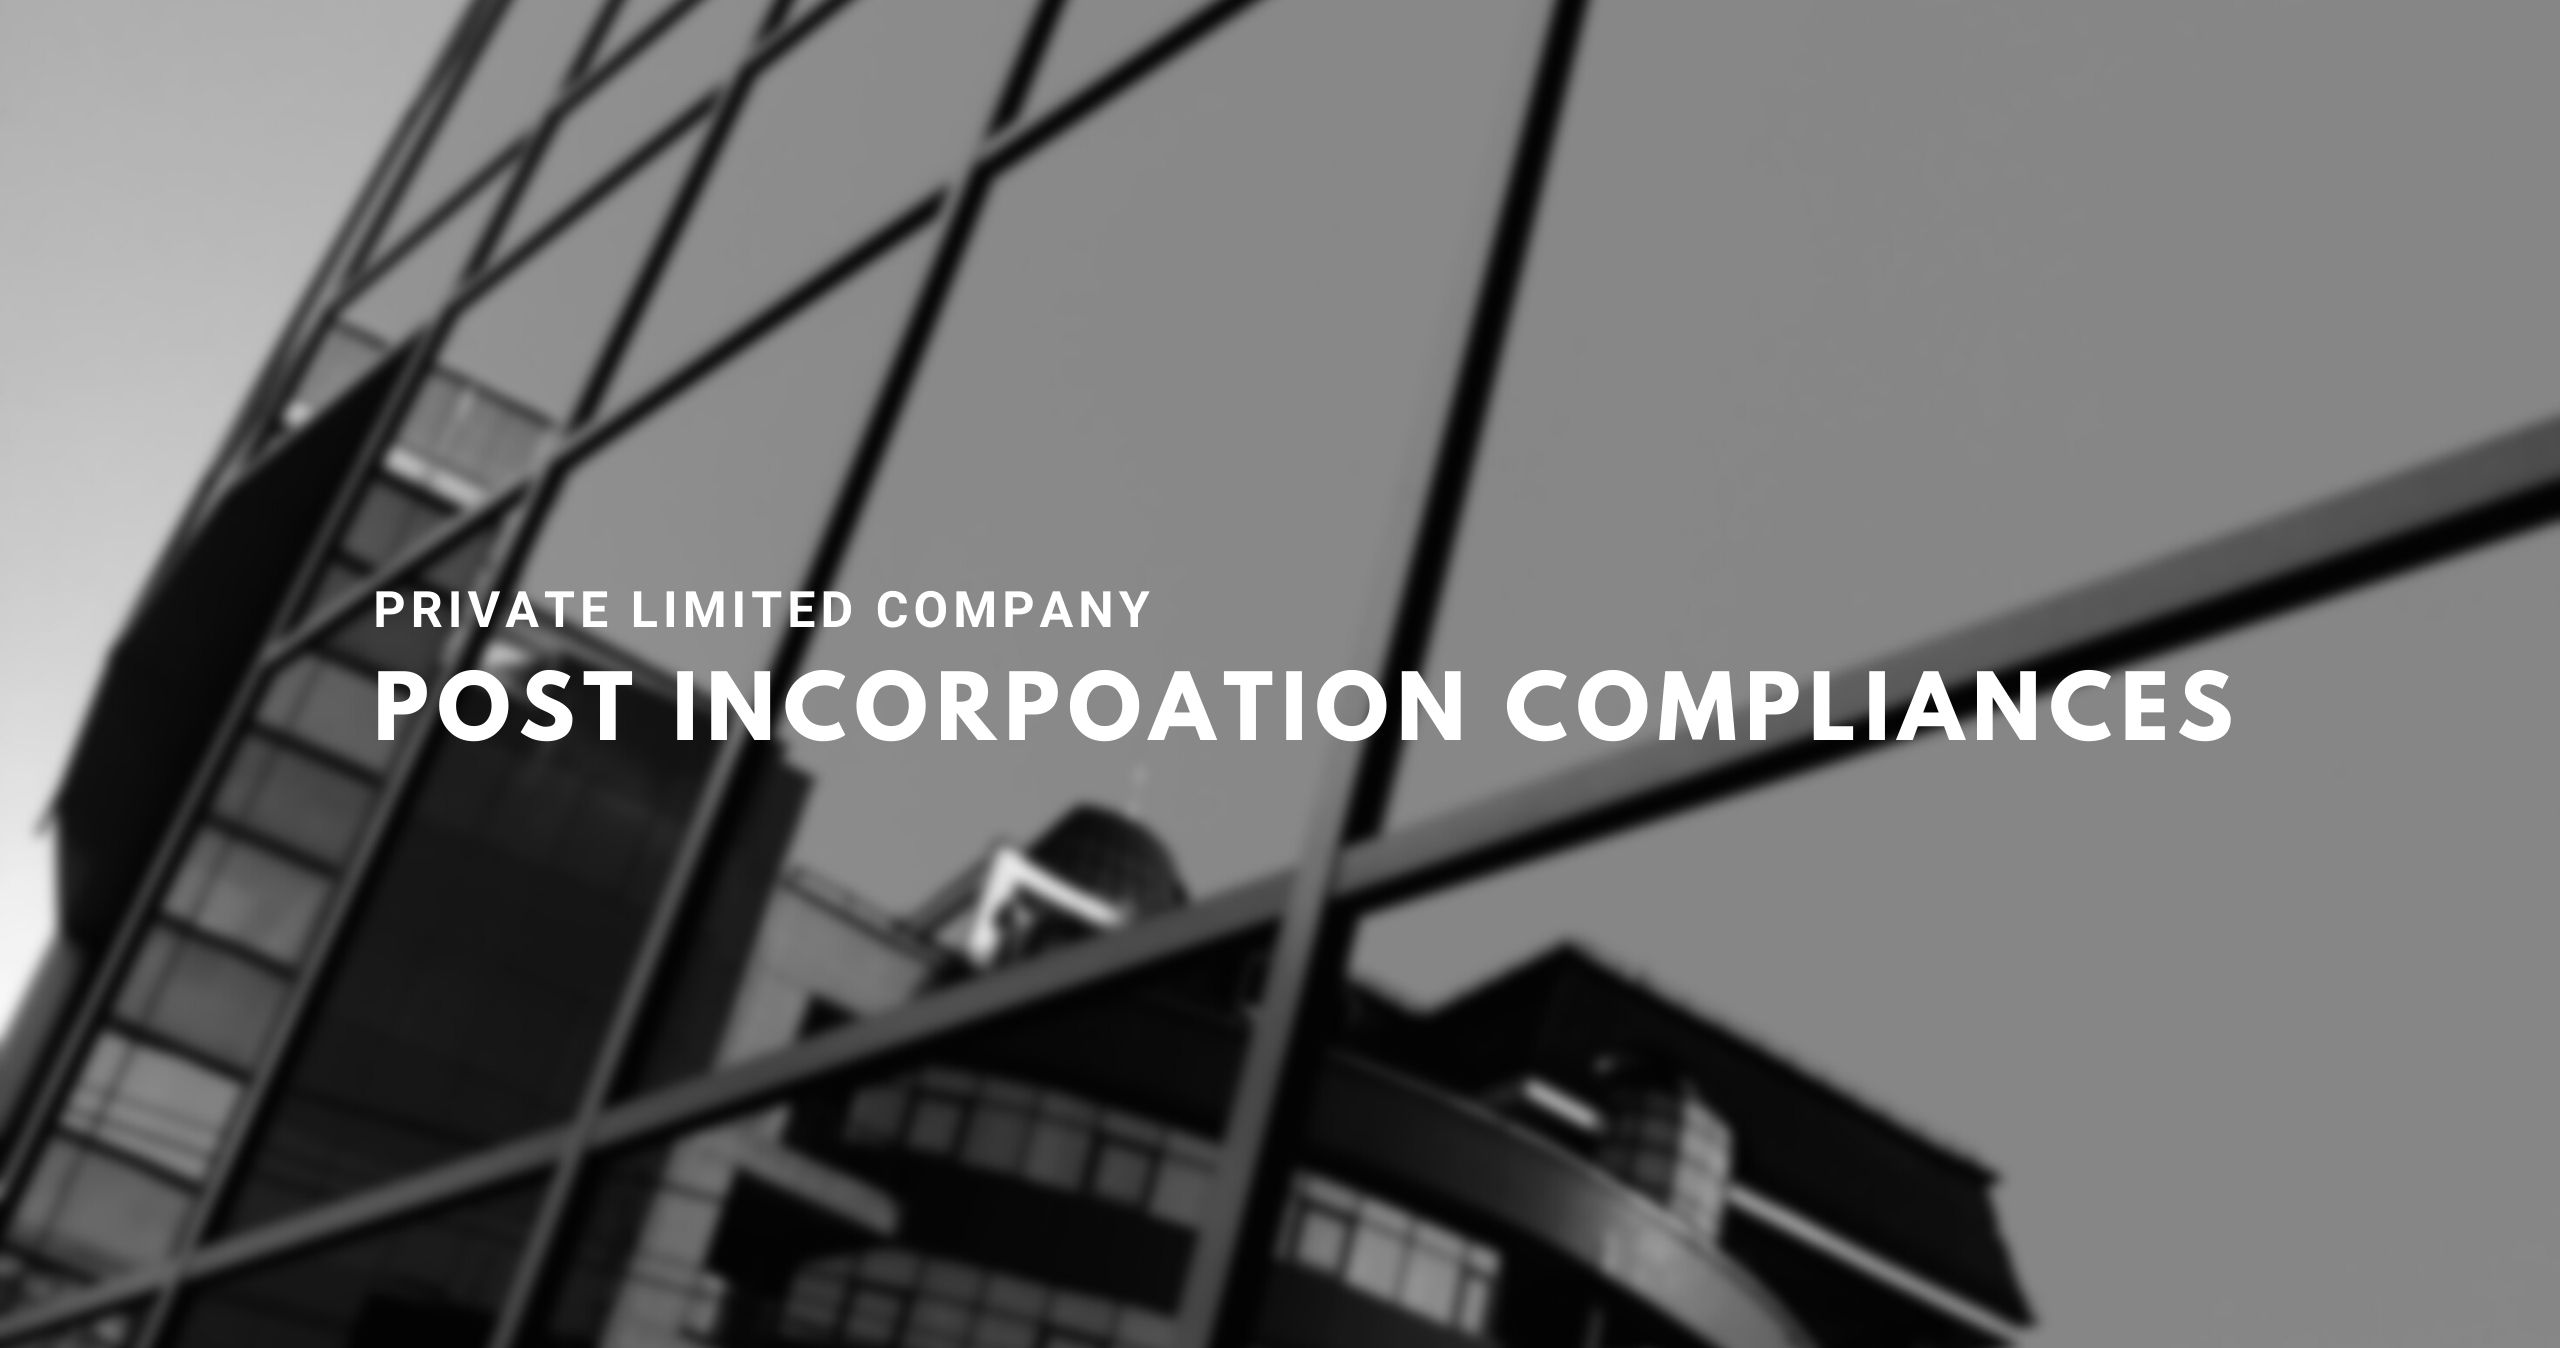 Private Limited Company post Incorporation compliances